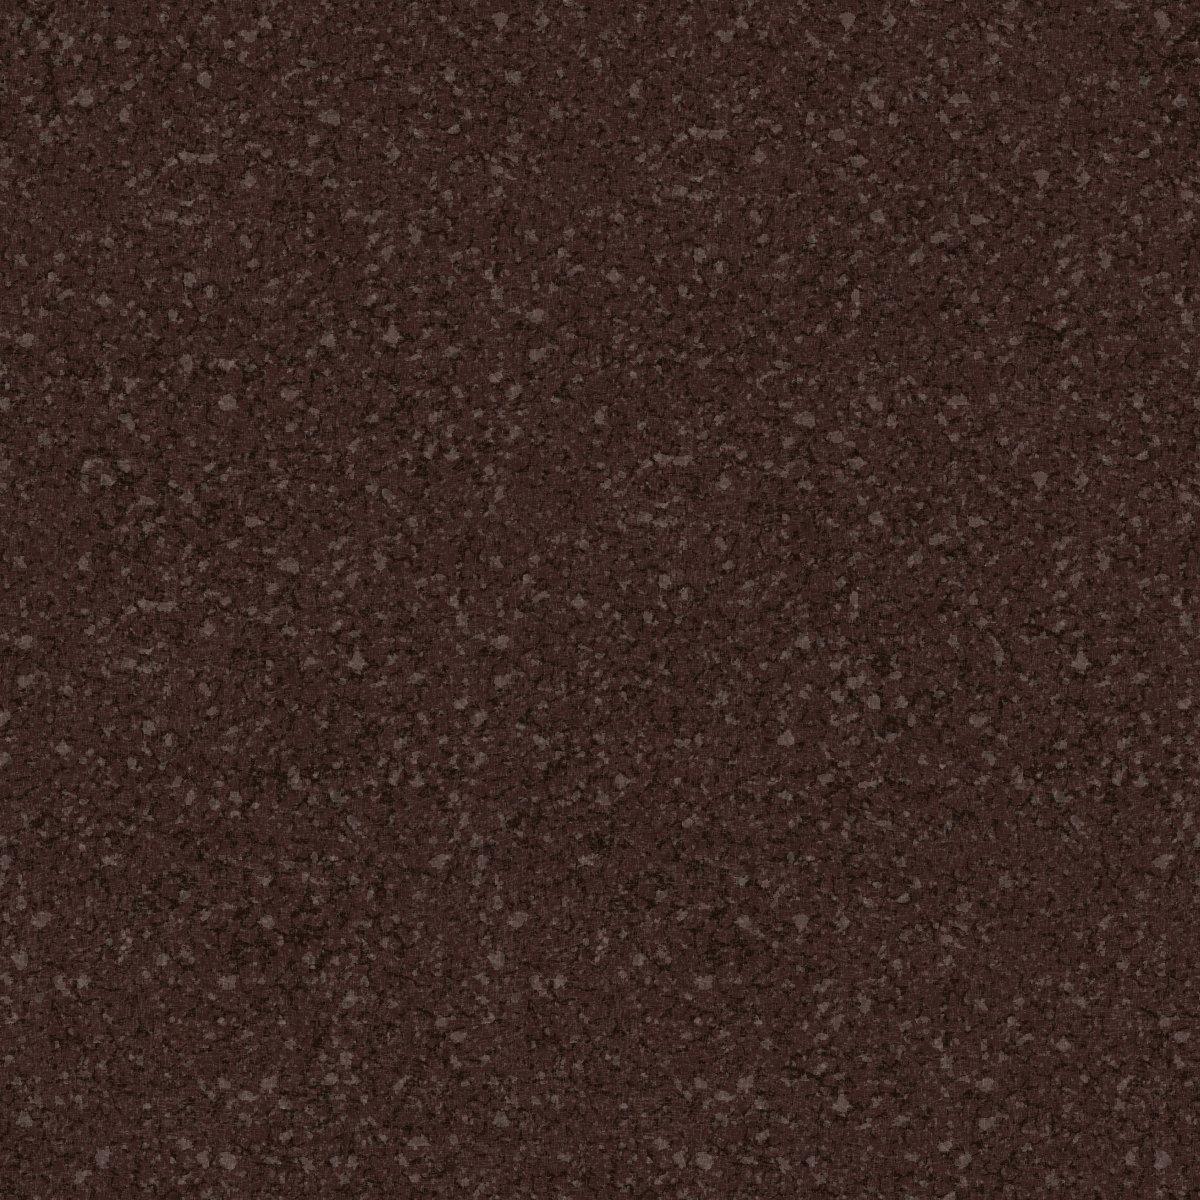 Swtexture Free Architectural Textures Brown Granite